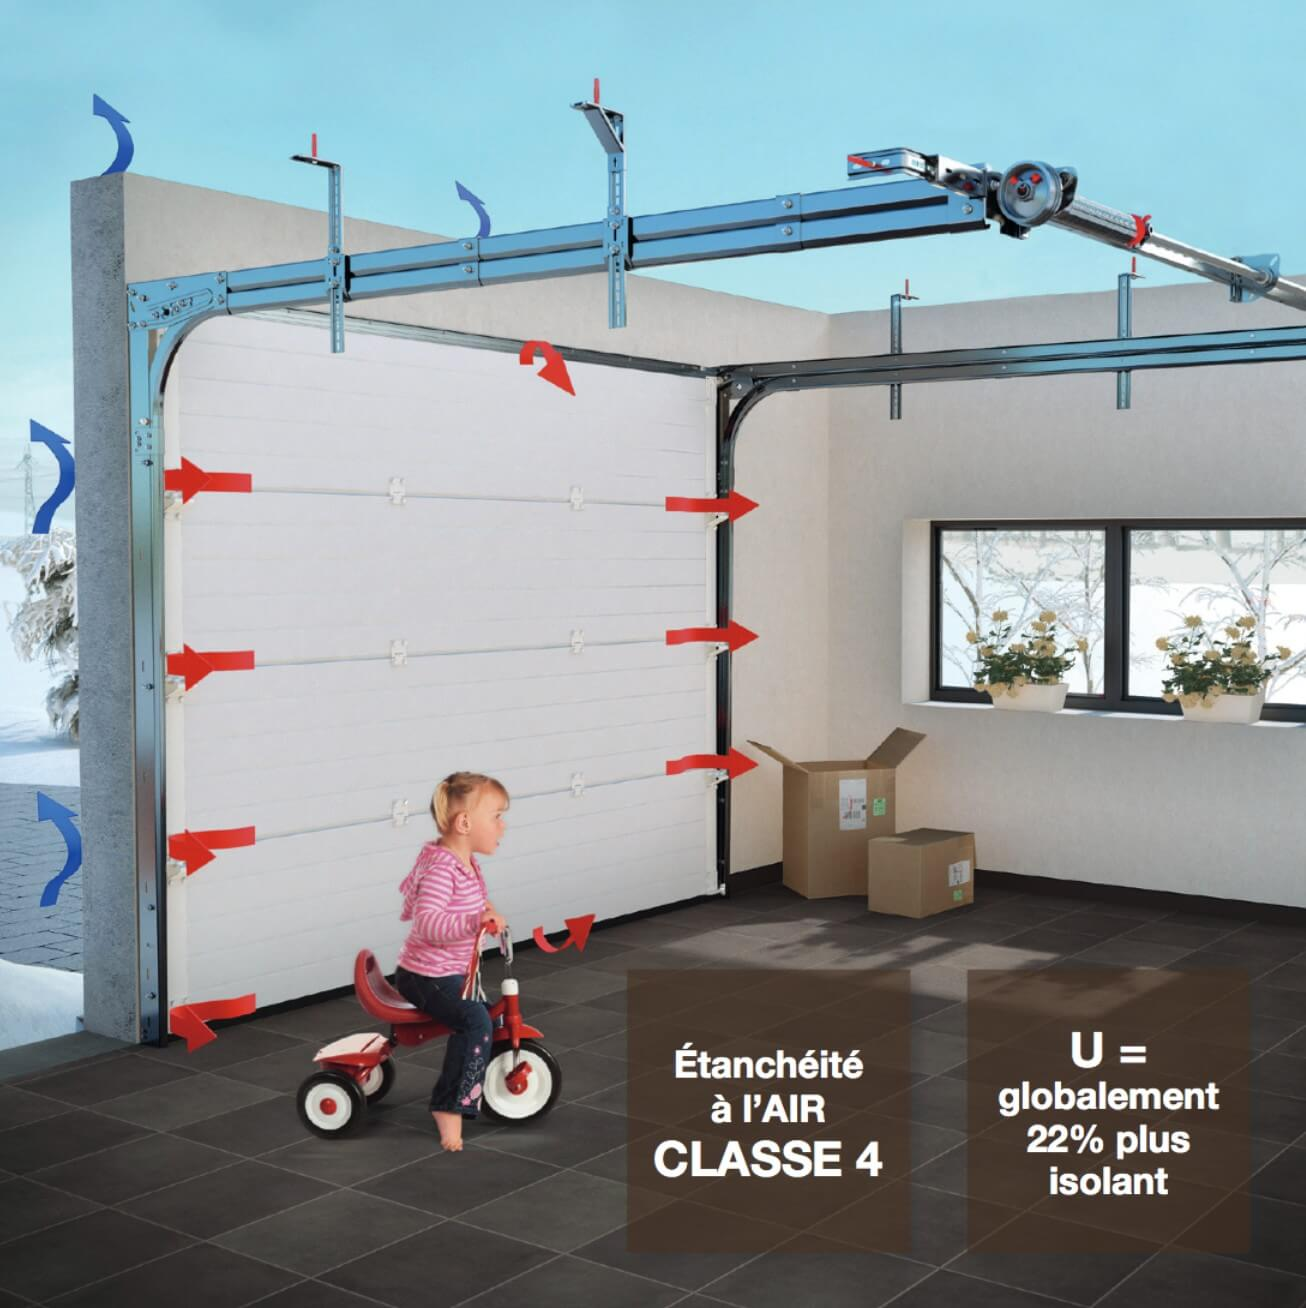 chatiere porte isolante gallery of porte coulissante vitr. Black Bedroom Furniture Sets. Home Design Ideas